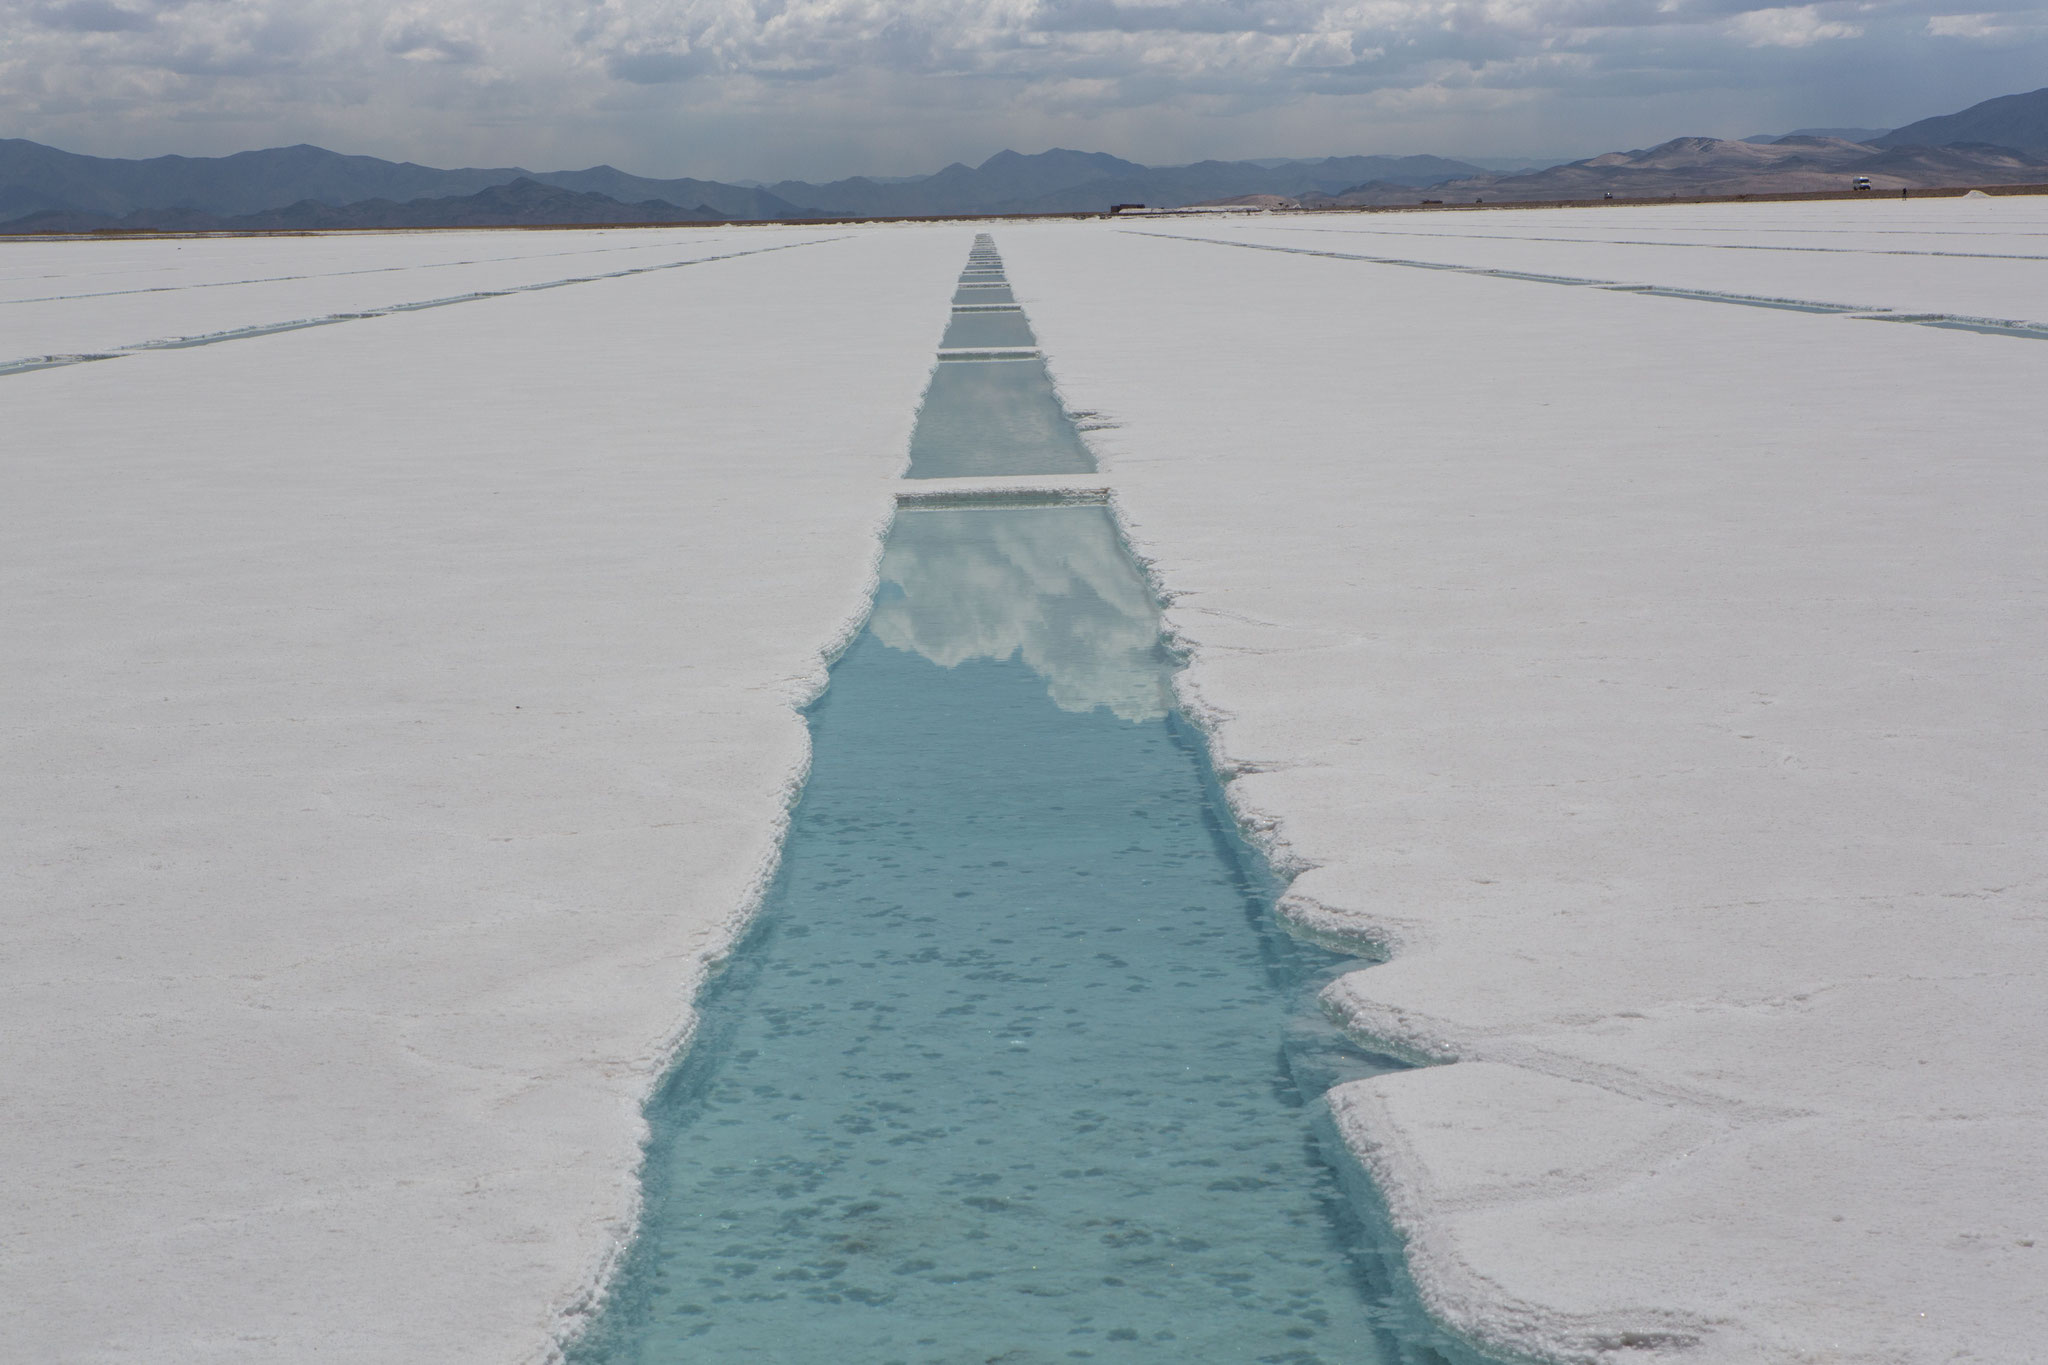 Salzgewinnung an den Salinas Grandes del Noroeste